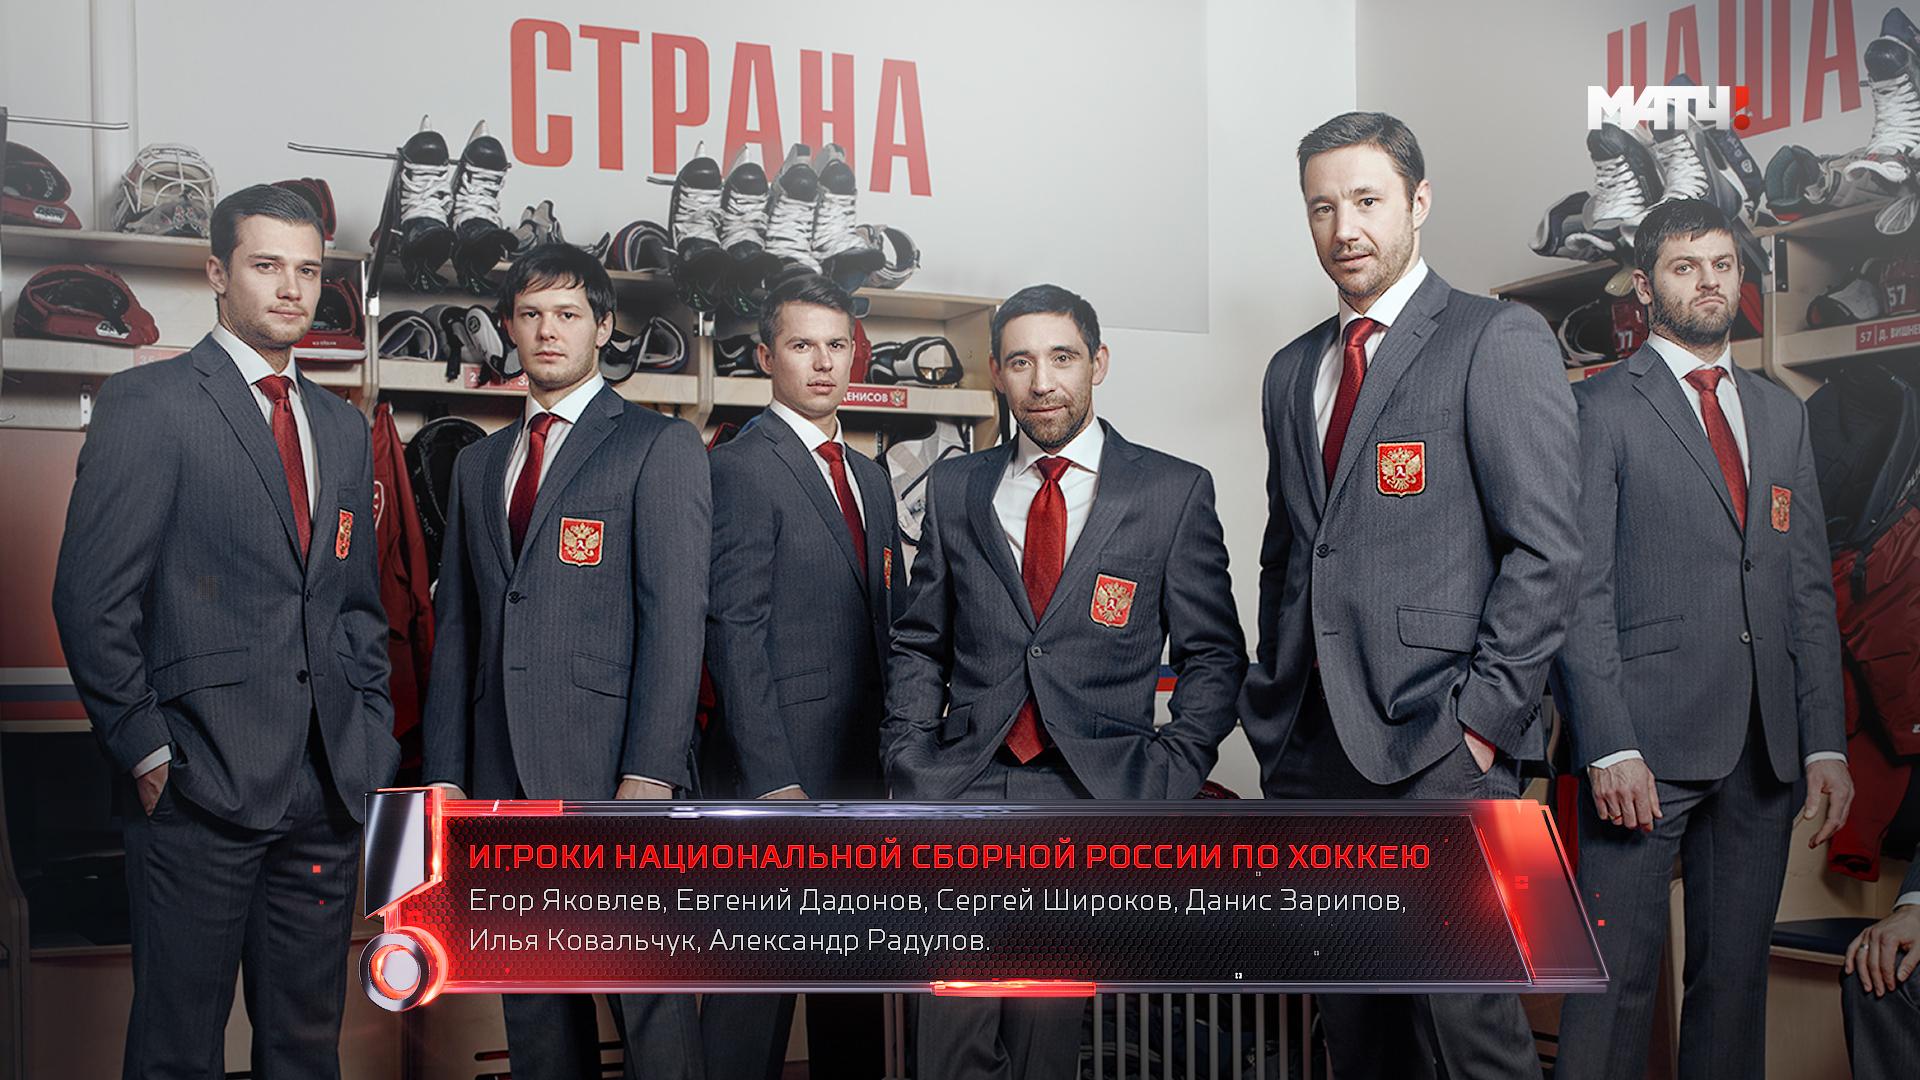 Match_Promo_PLASHKA2.jpg